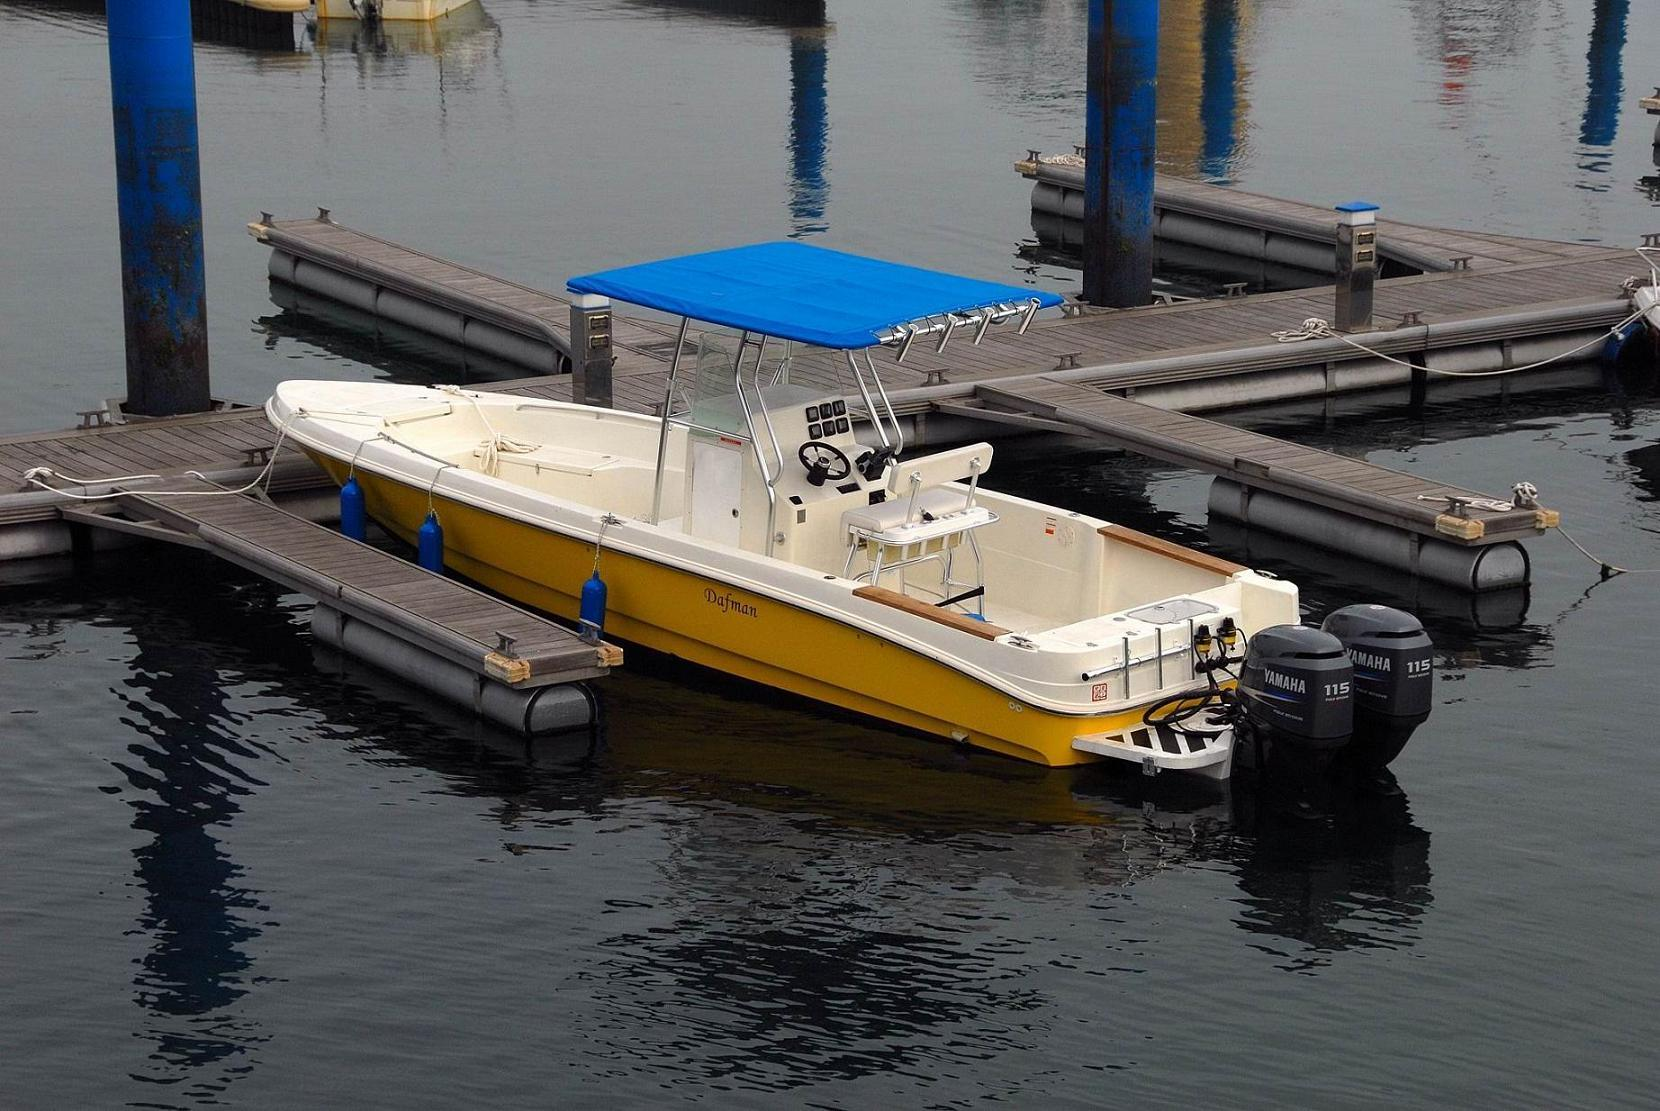 China dafman offshore 30 fishing boat photos pictures for Offshore fishing boat